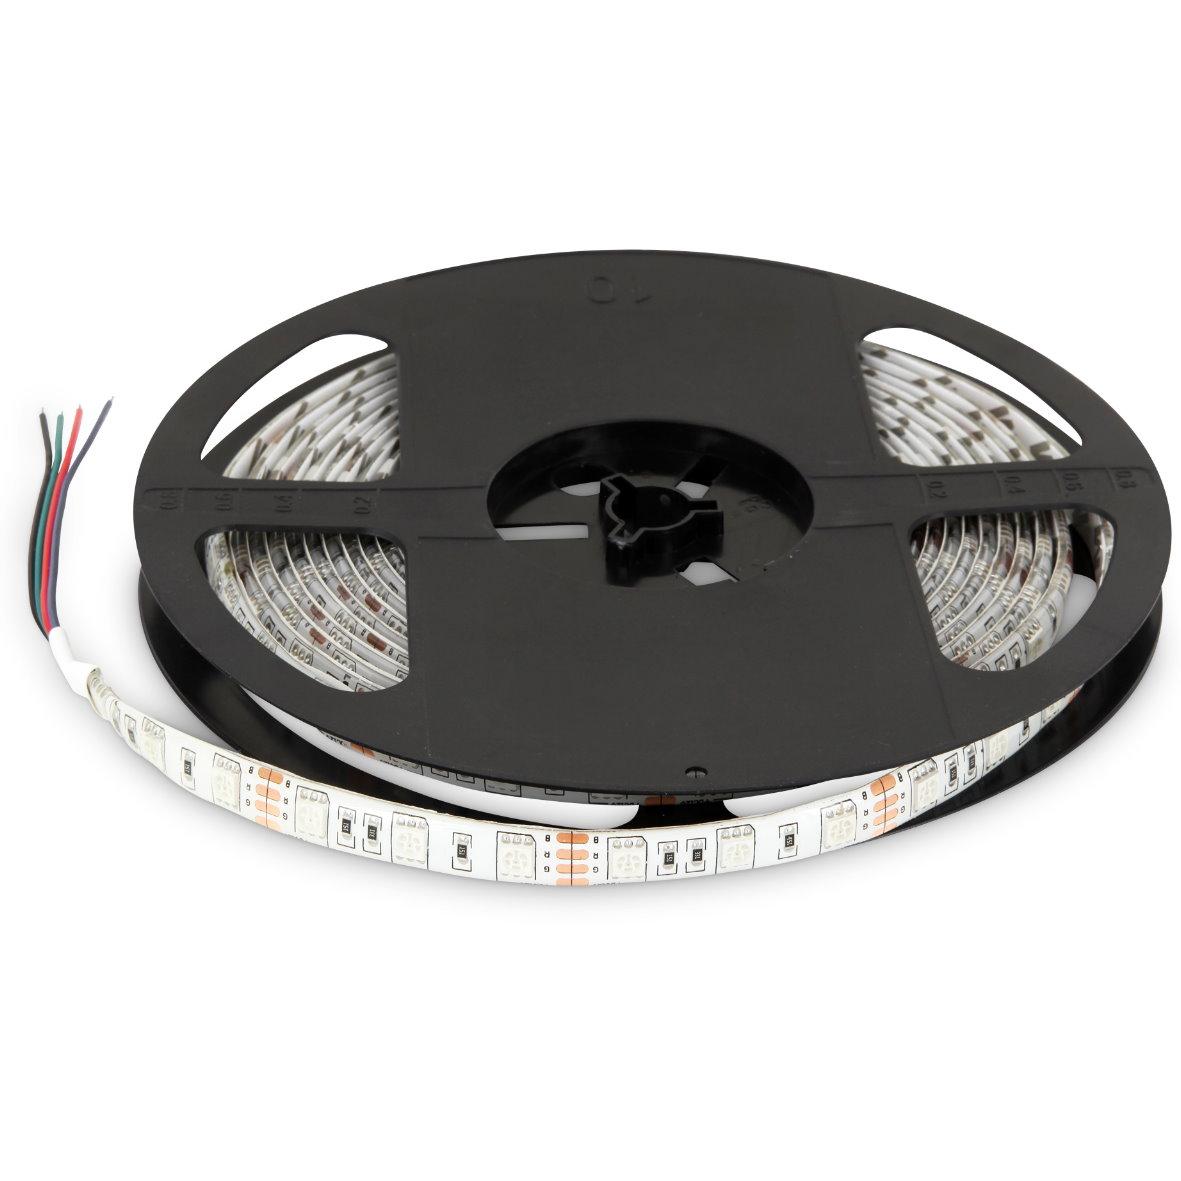 4 98 eur m led rgb lichtband 5m 72w ip65 dimmbar aussen strip 300x 5050 chip ebay. Black Bedroom Furniture Sets. Home Design Ideas